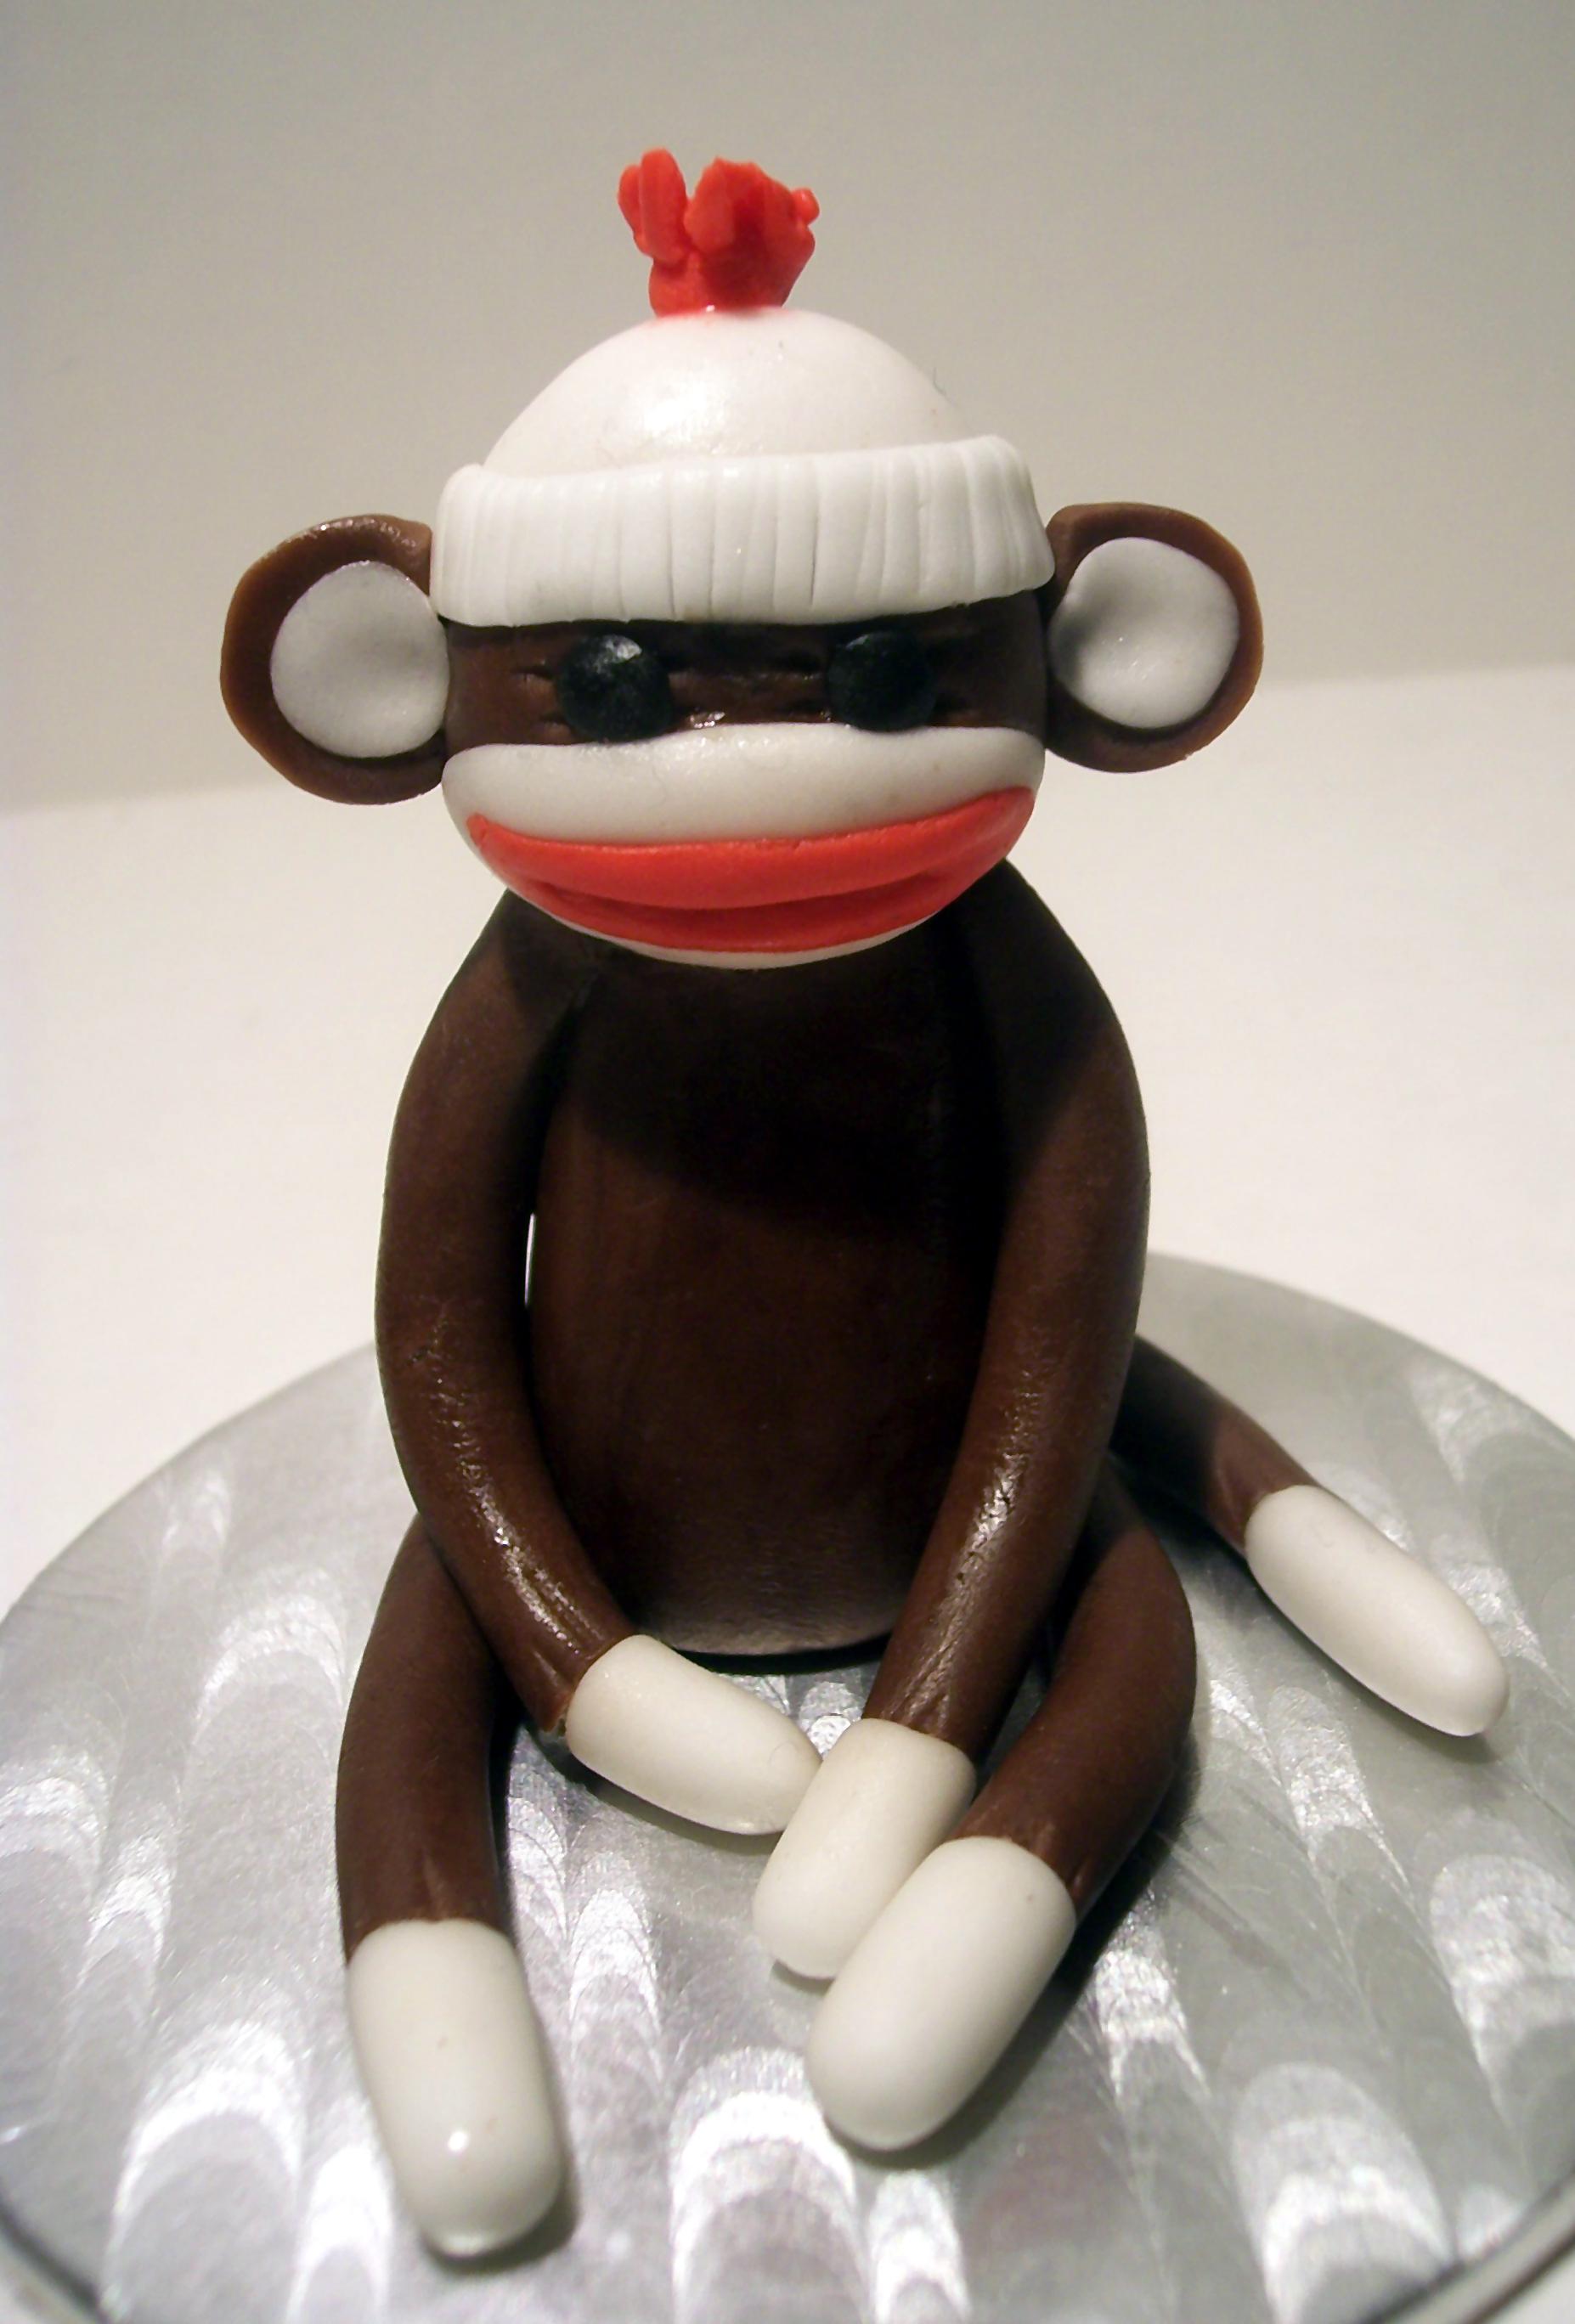 Cake Decorating Animal Figures Gumpaste Animals The Sugar Lane